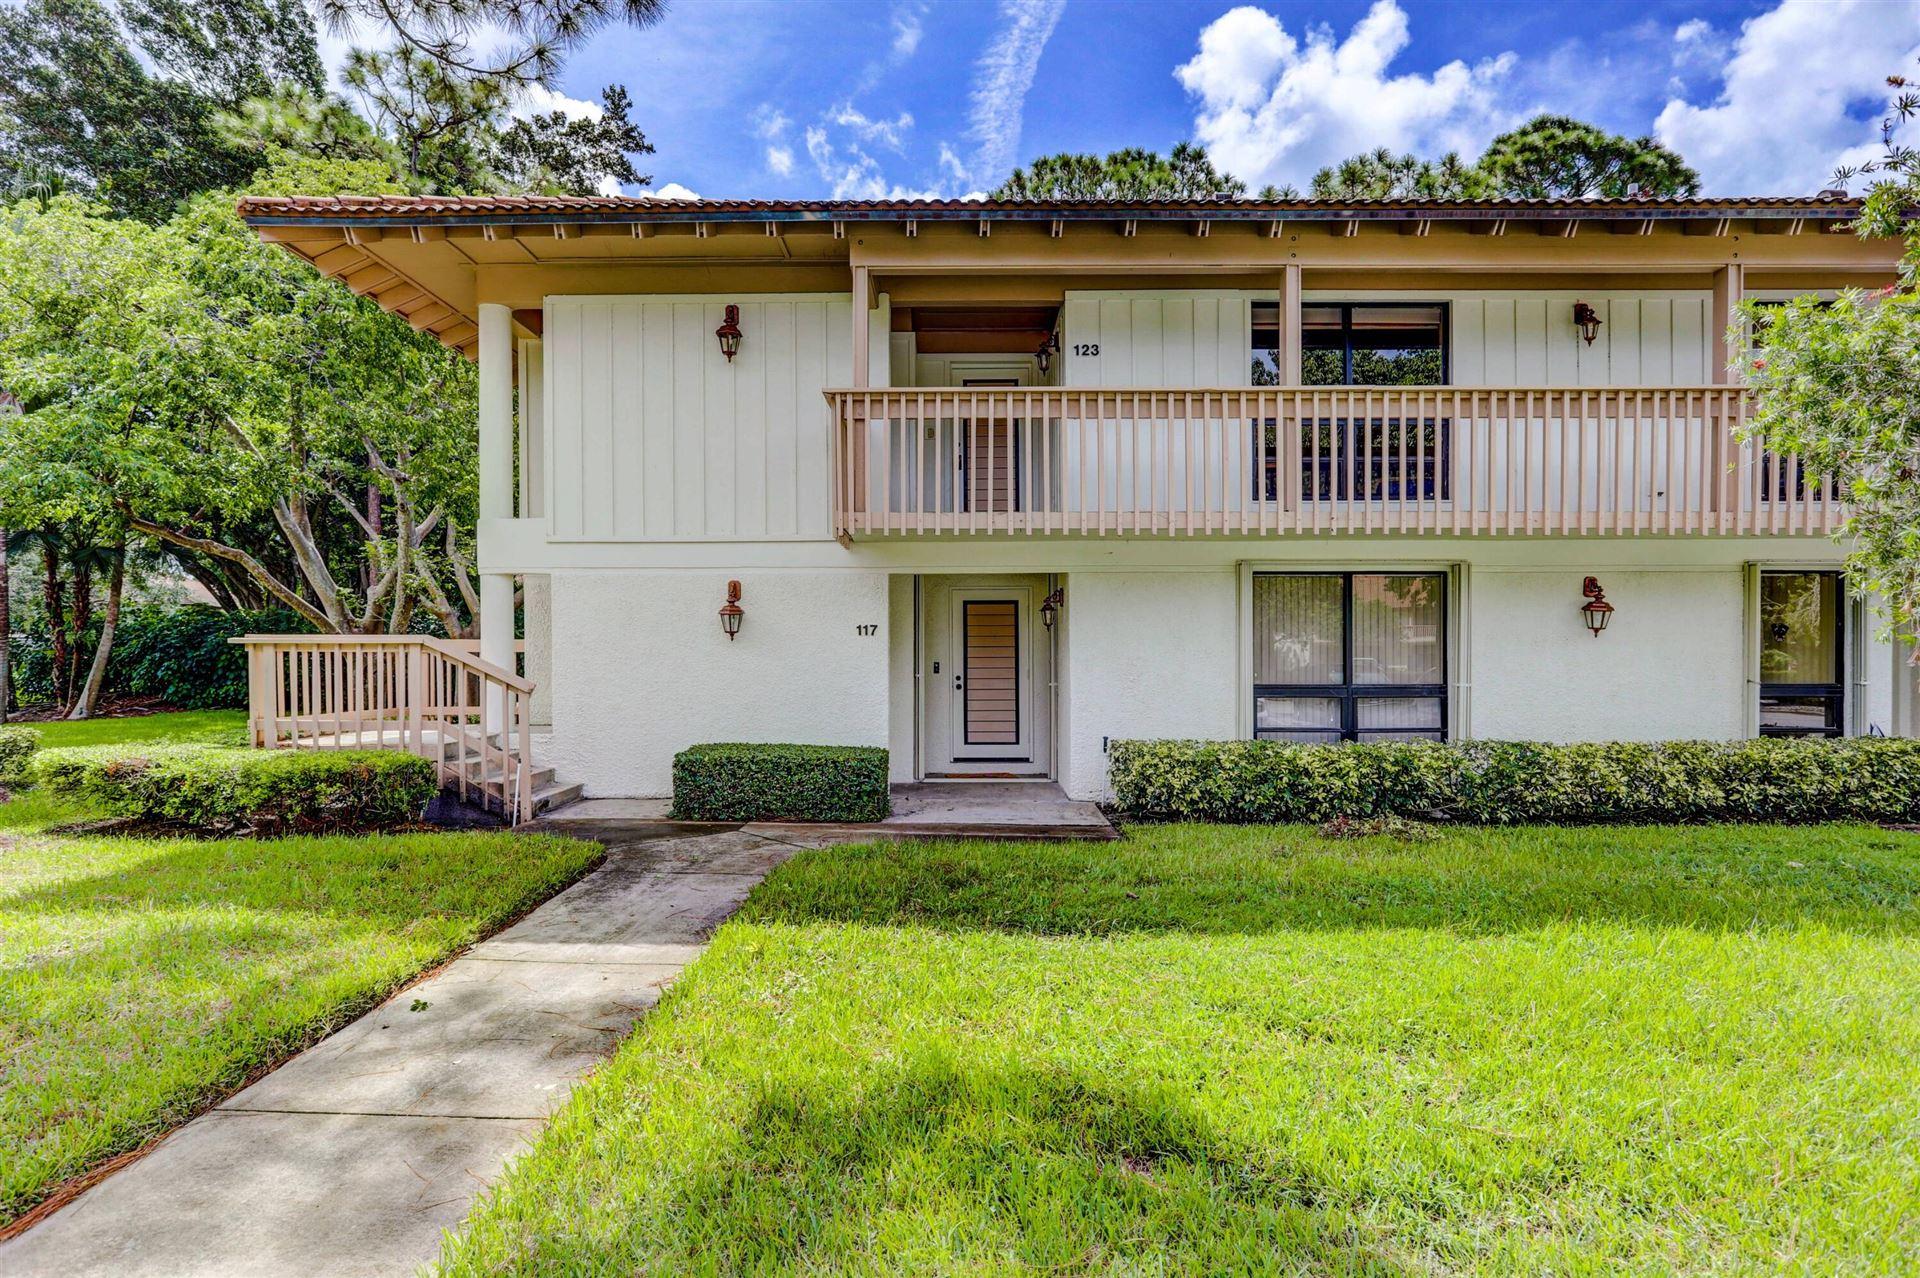 Photo of 123 Brackenwood Road, Palm Beach Gardens, FL 33418 (MLS # RX-10741372)